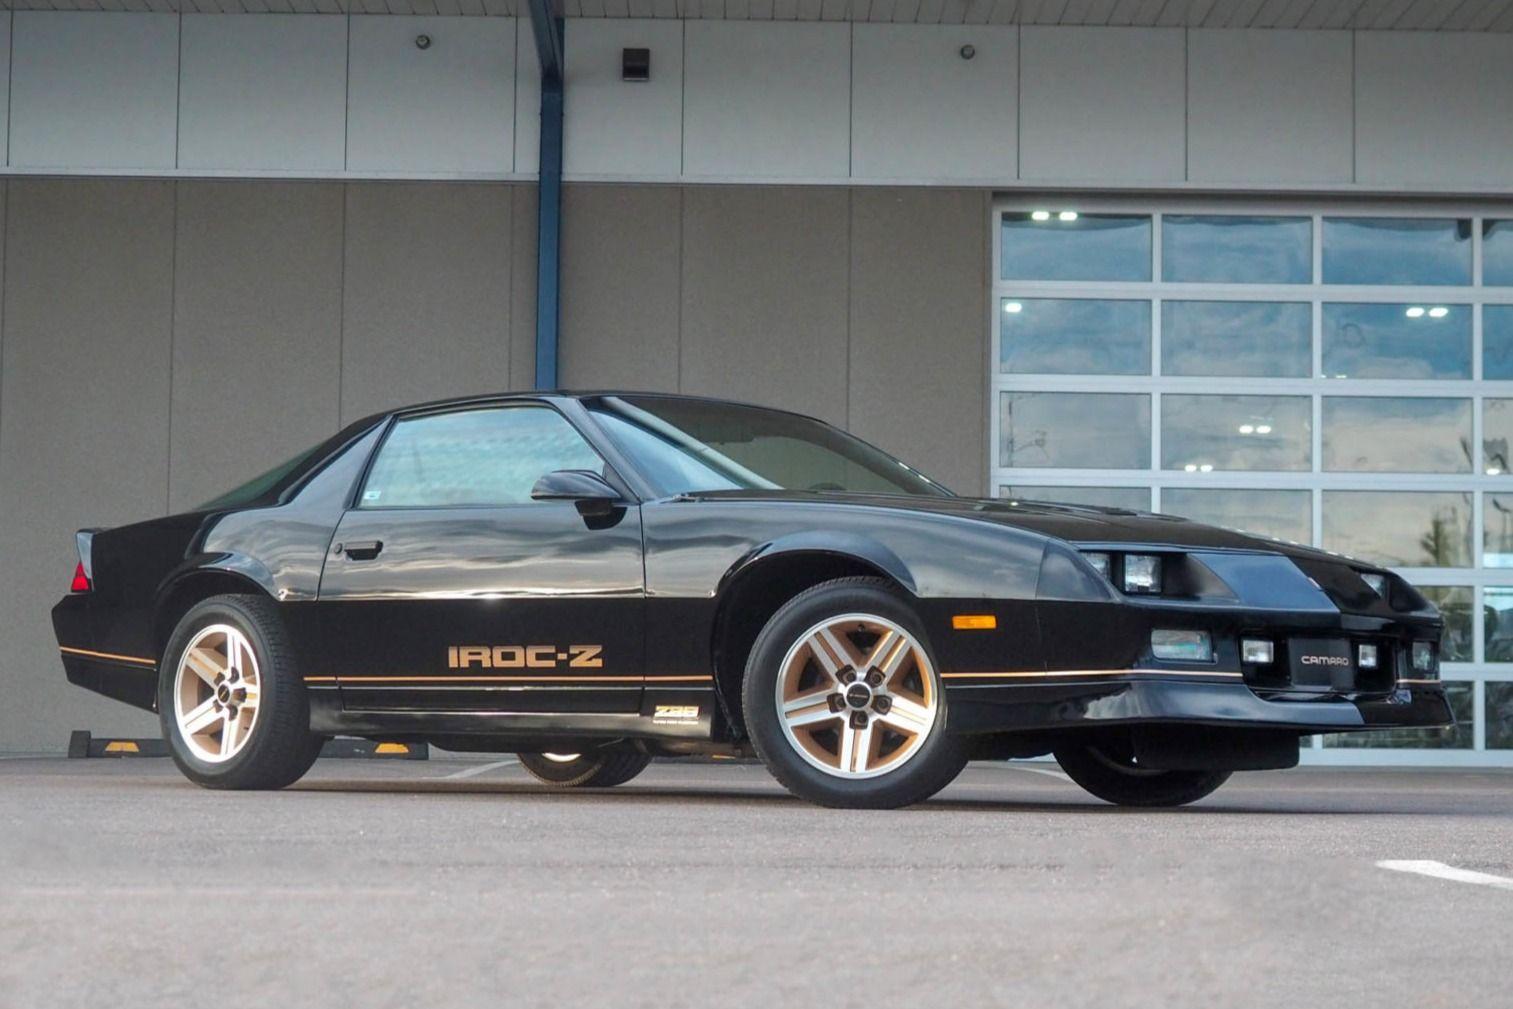 "<img src=""1985-chevy-camaro.jpeg"" alt=""A 1985 Chevrolet Camaro Z28 IROC-Z"">"